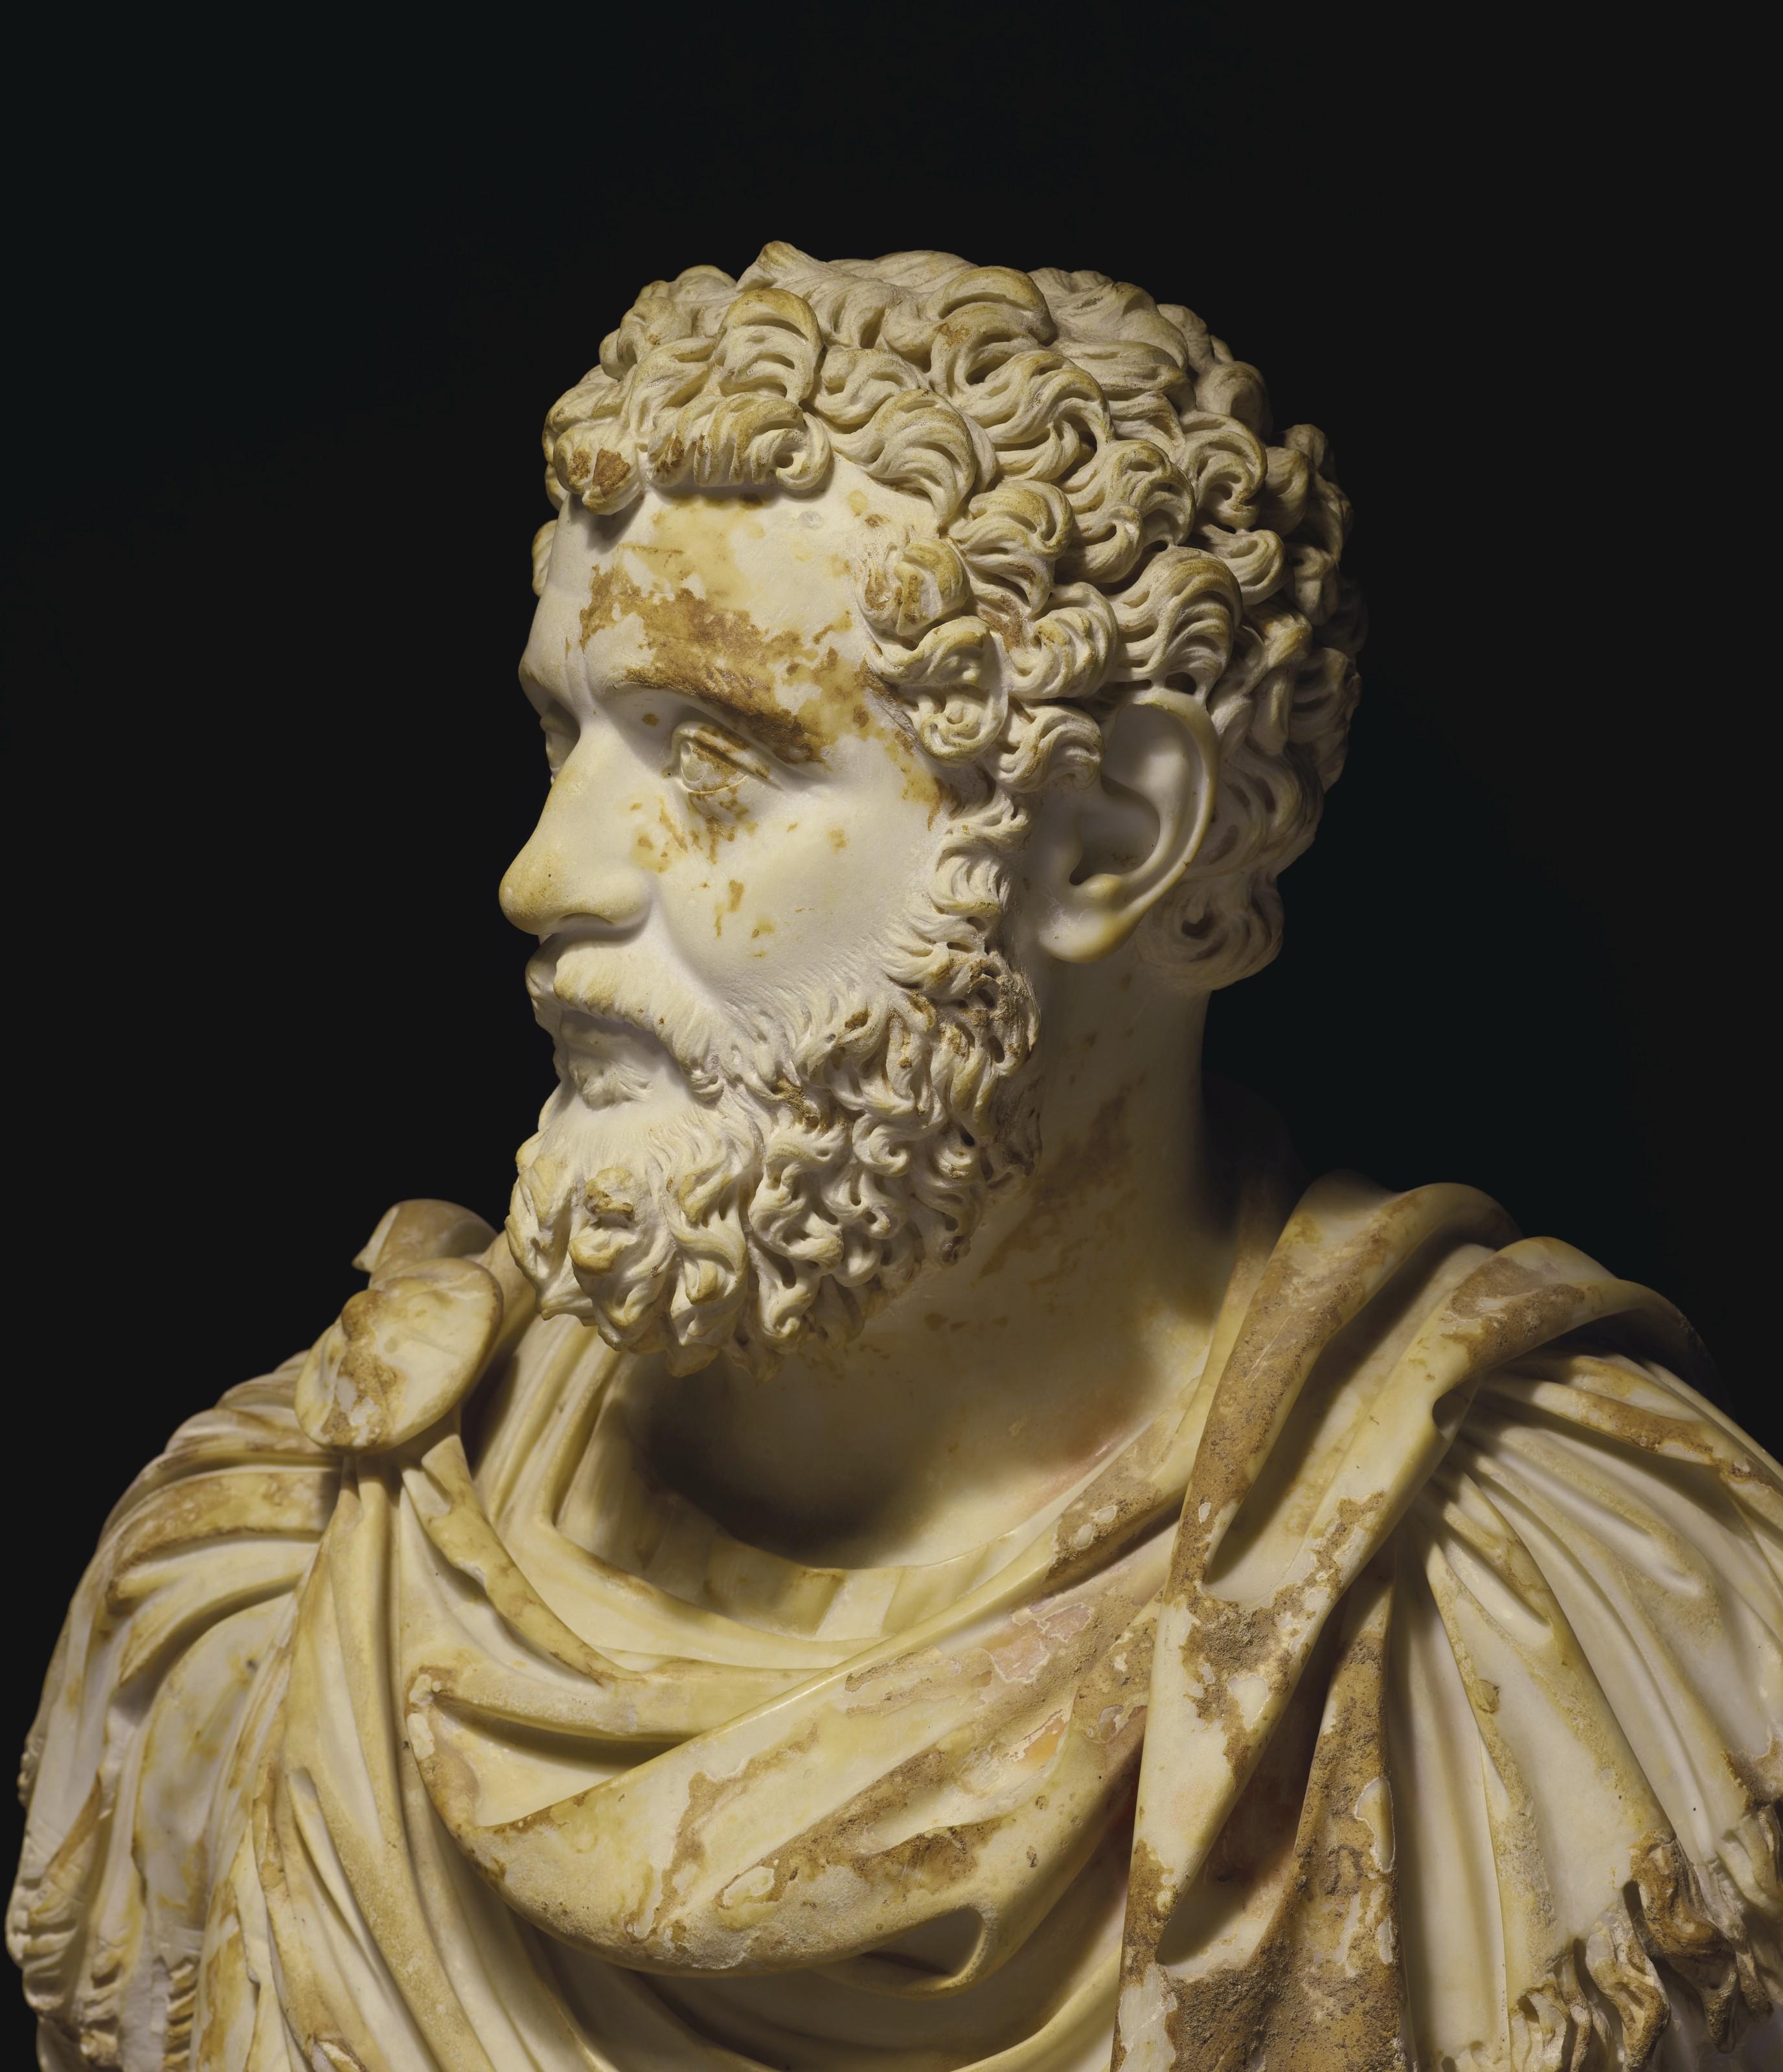 A ROMAN MARBLE PORTRAIT BUST OF EMPEROR DIDIUS JULIANUS